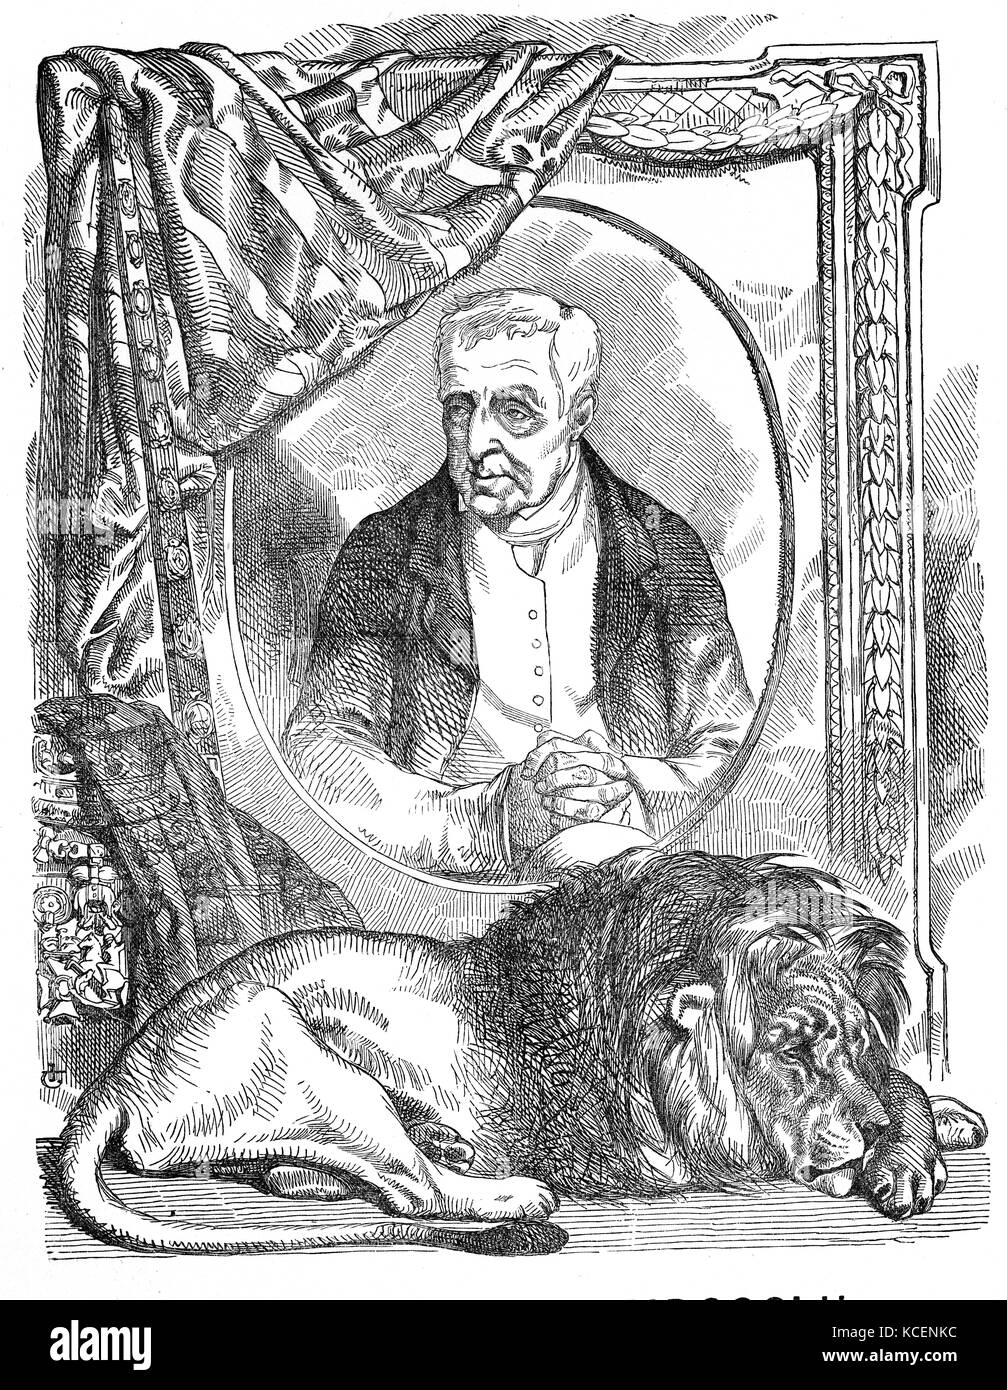 Portrait of Arthur Wellesley, 1st Duke of Wellington (1769-1852) an Anglo-Irish soldier, statesman, and leading - Stock Image